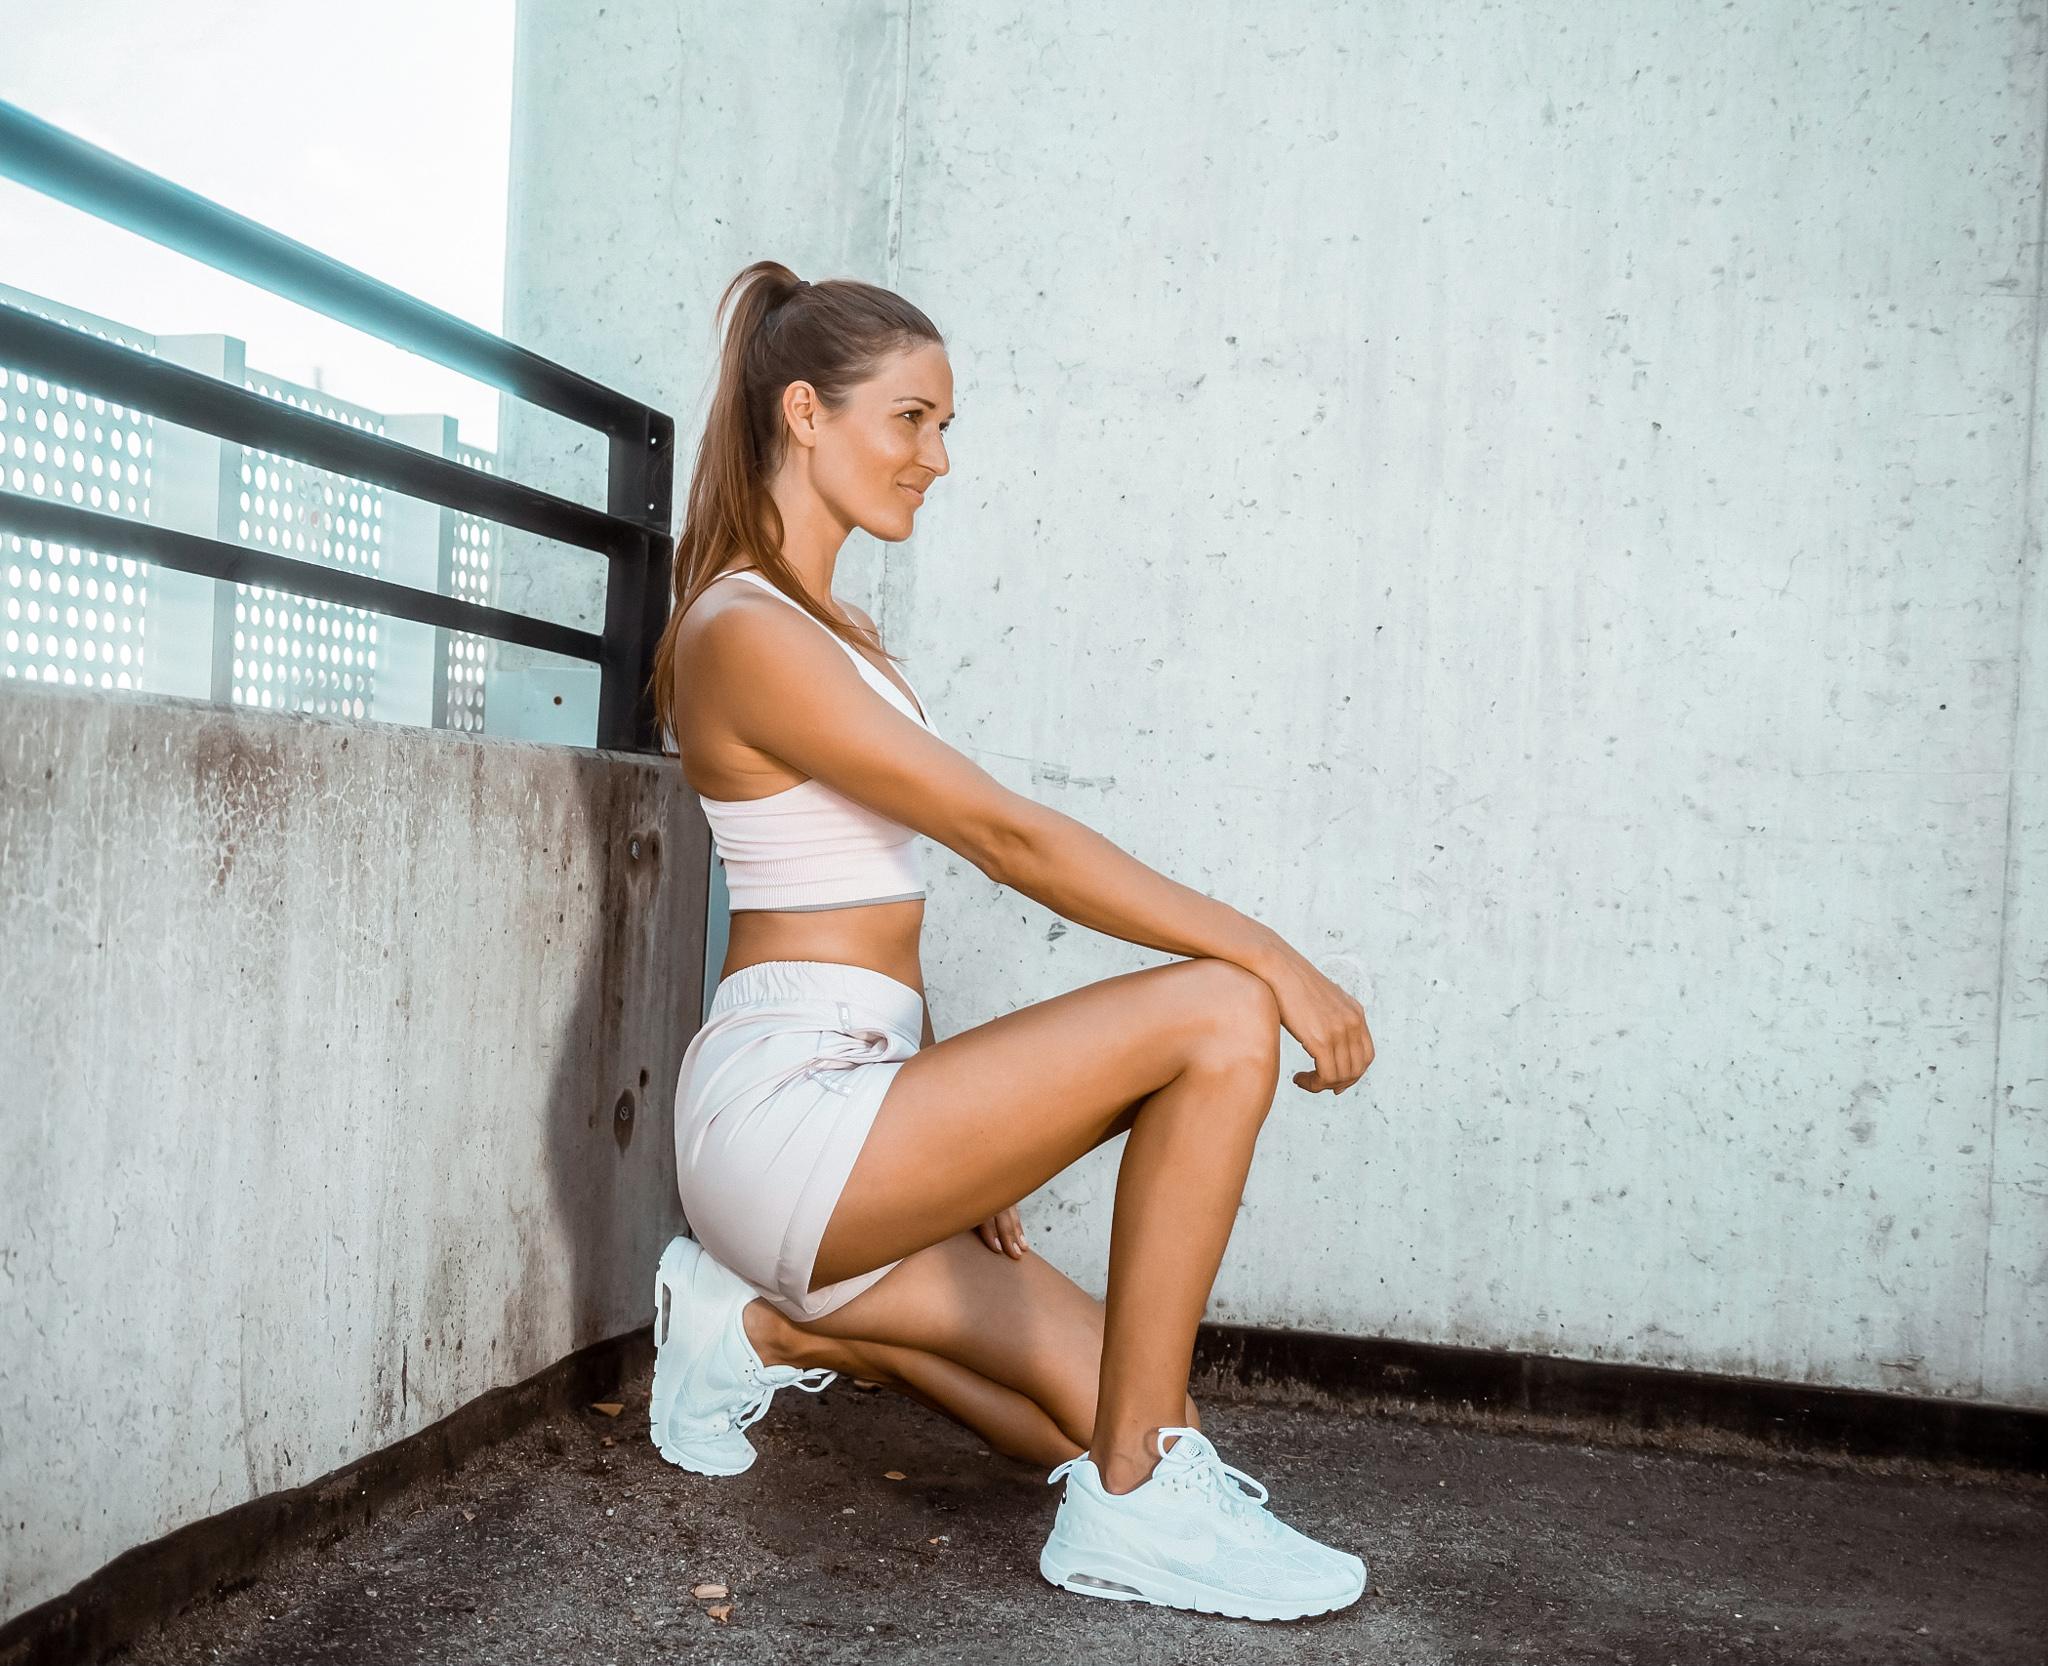 Kontakt the healthy fit